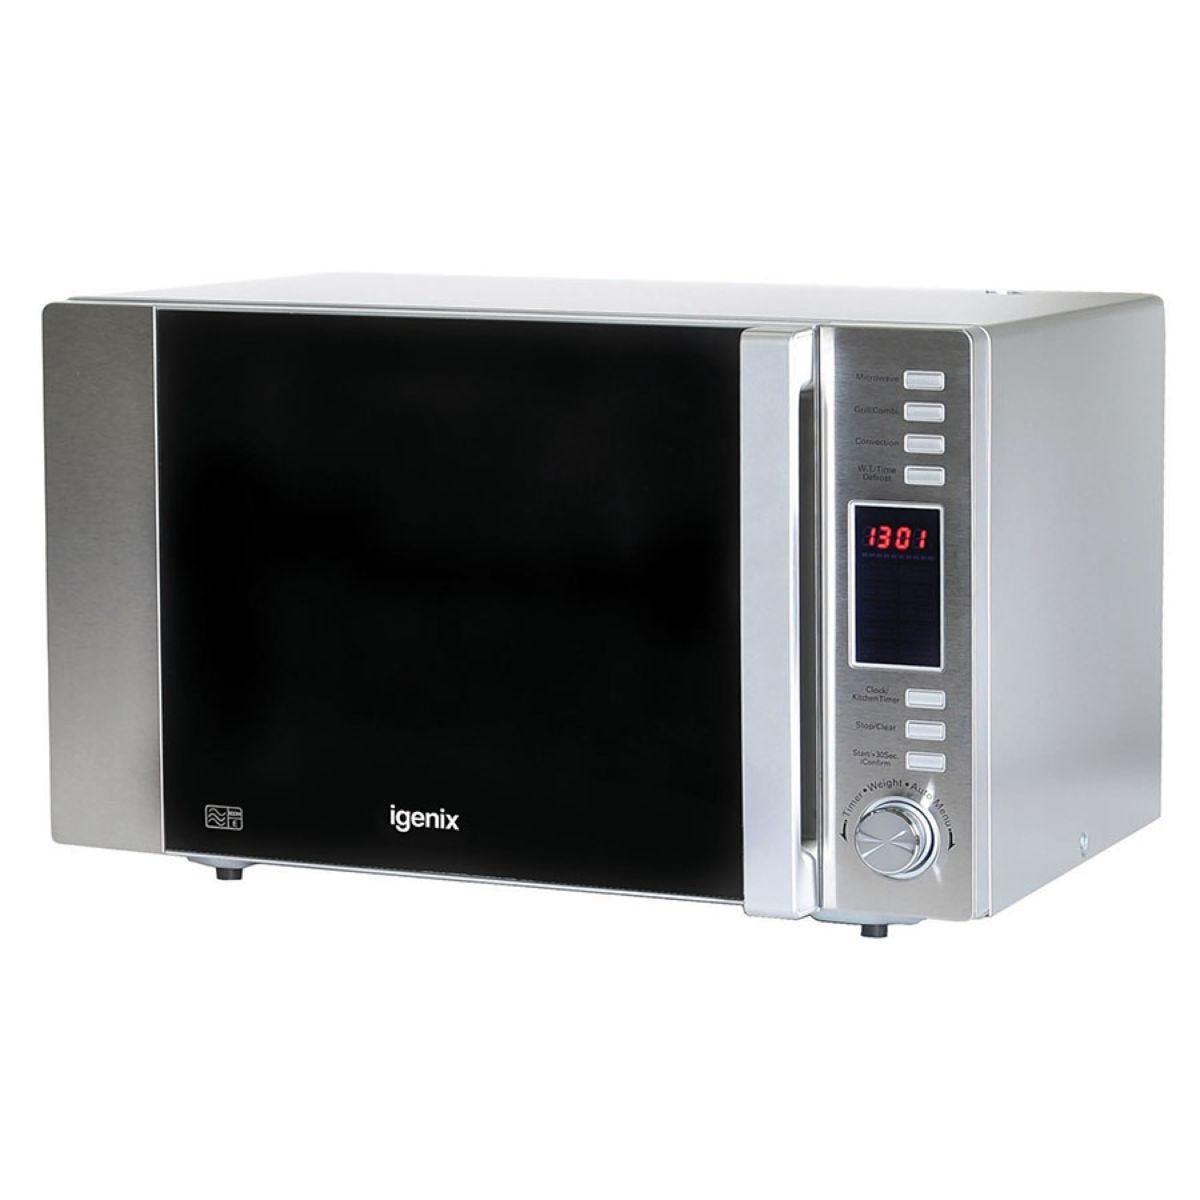 Igenix IG3091 30L Digital Combination 900W Microwave – Stainless Steel